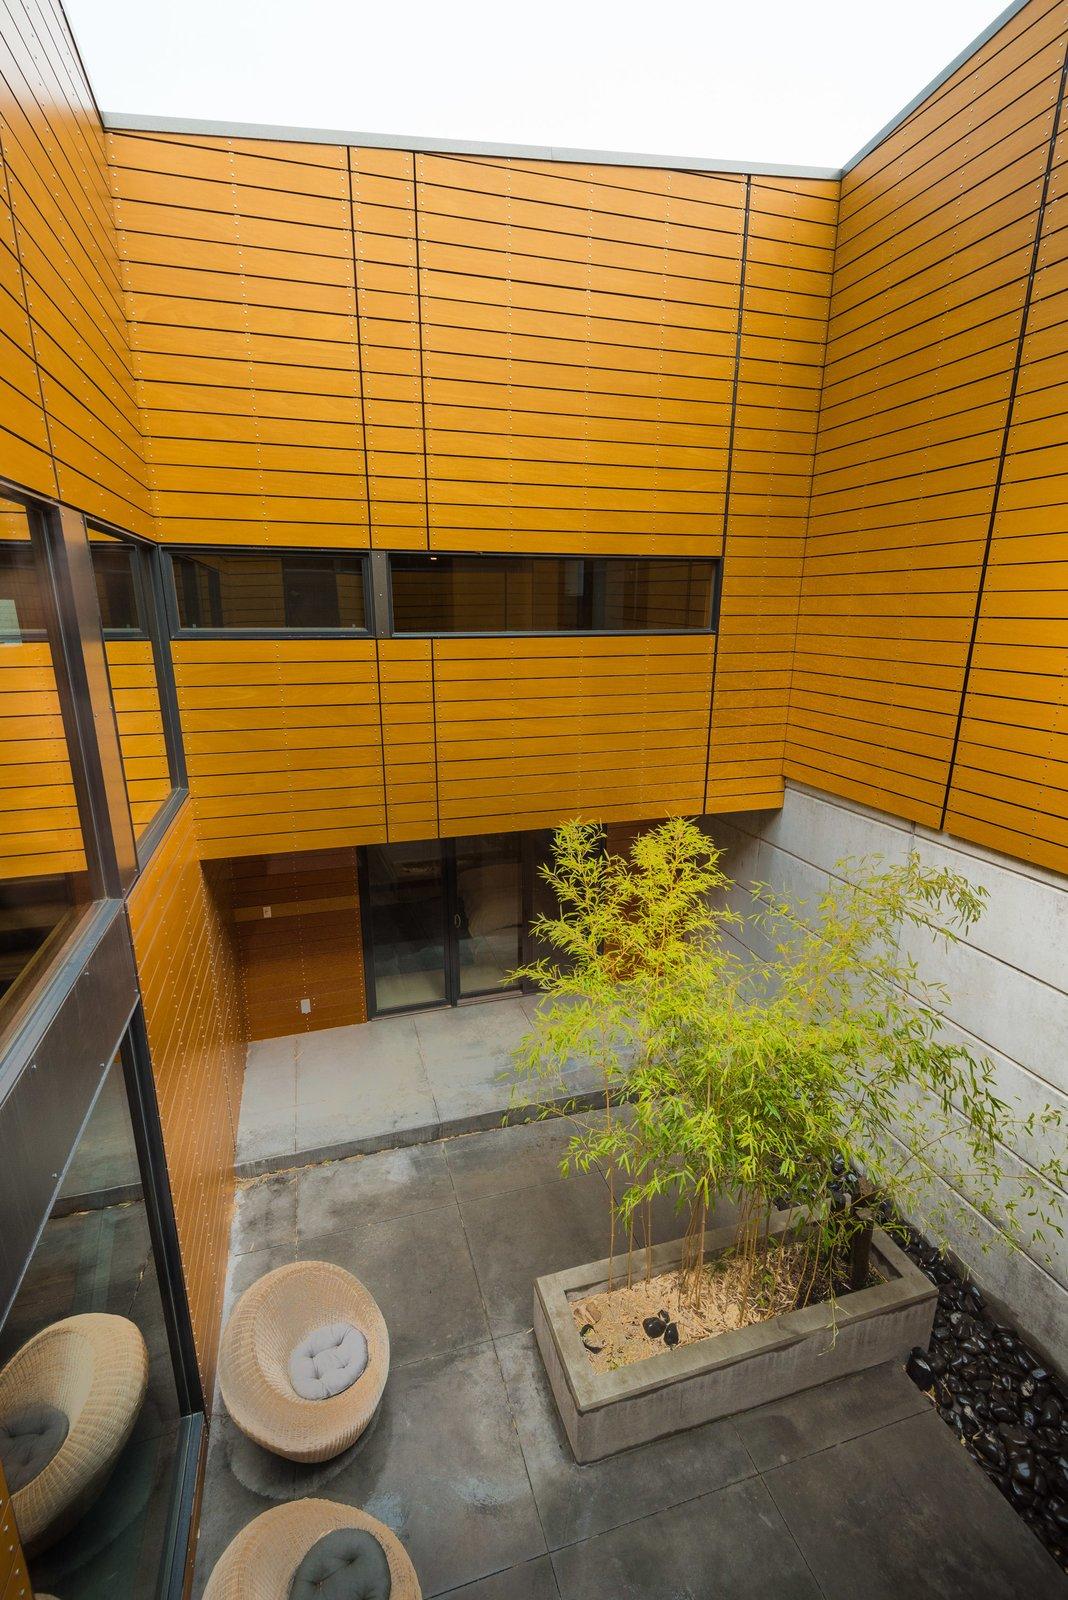 Outdoor, Raised Planters, Hardscapes, and Concrete Patio, Porch, Deck Interior courtyard  High Desert Pavillion